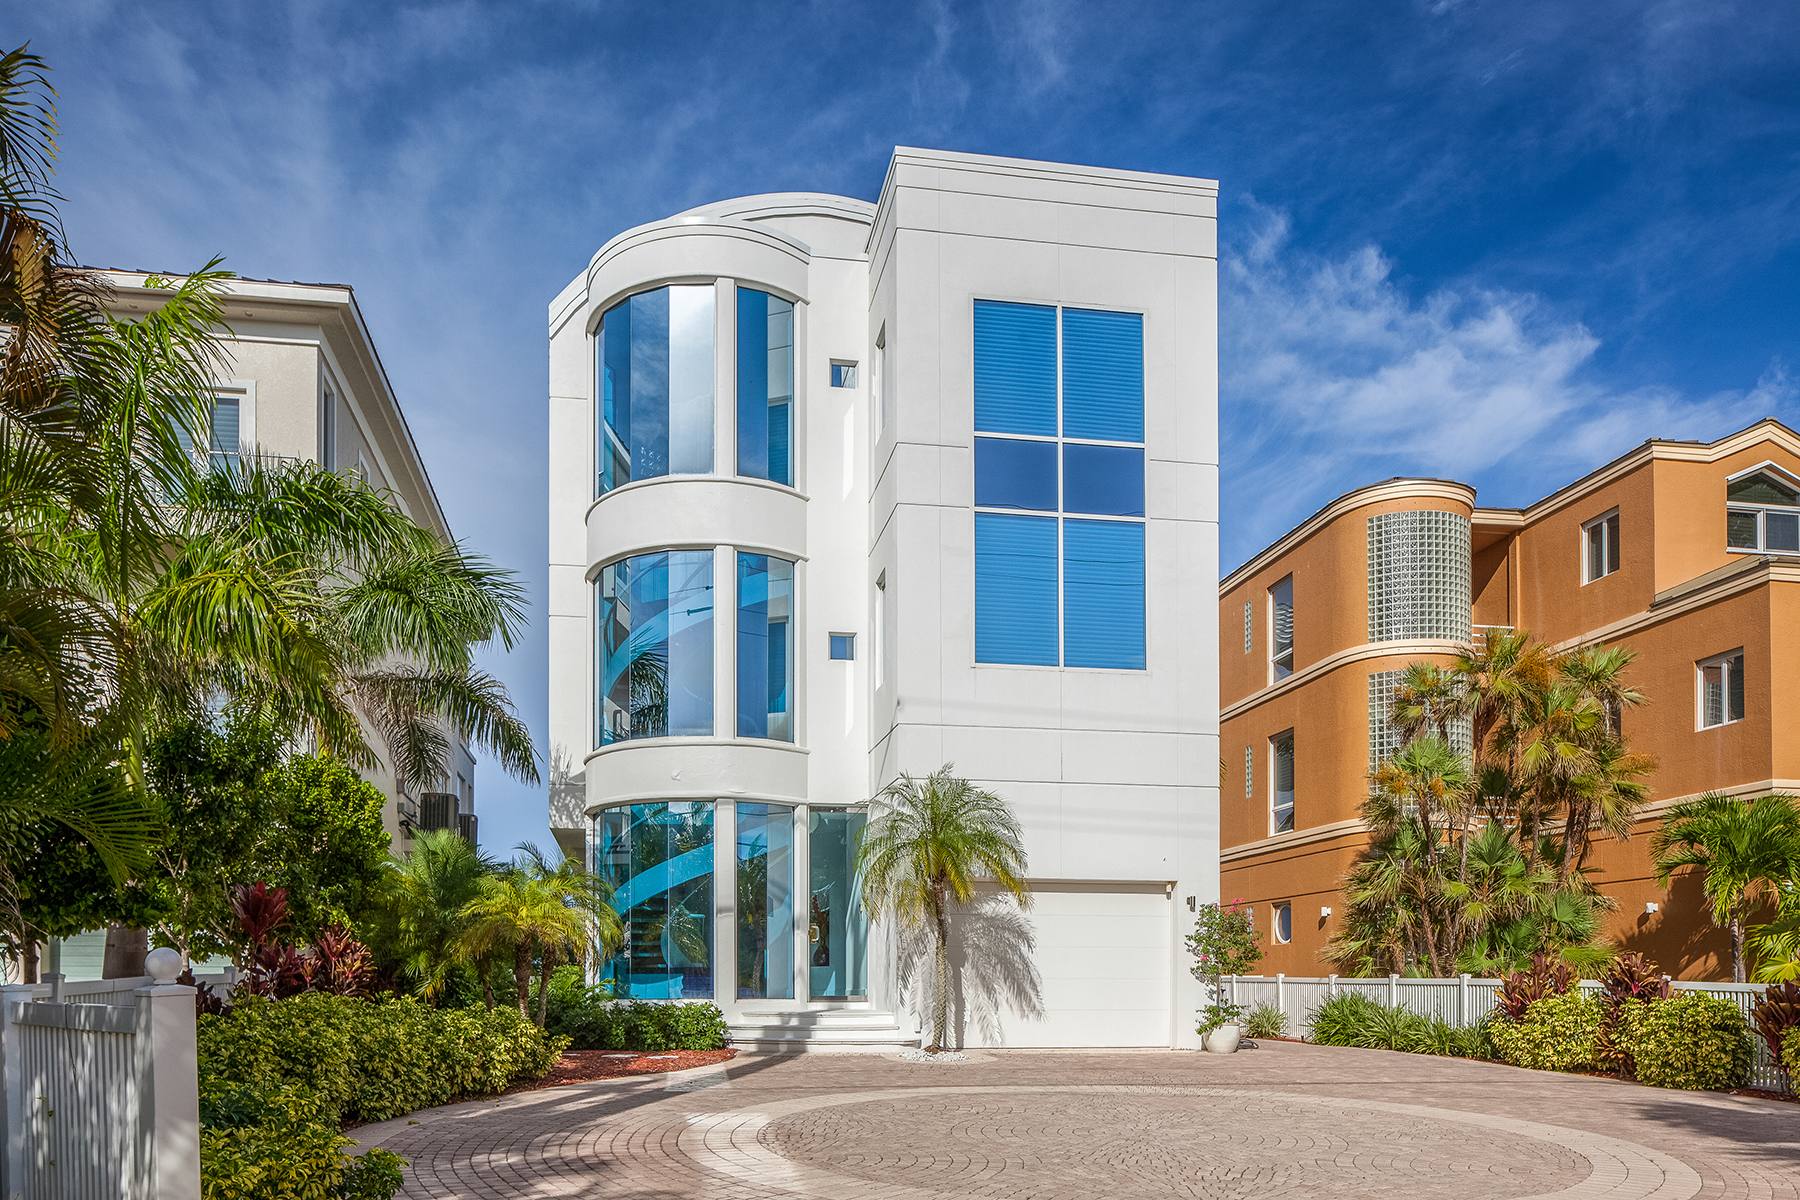 Single Family Home for Sale at BONITA BEACH 26972 Hickory Blvd, Bonita Springs, Florida 34134 United States